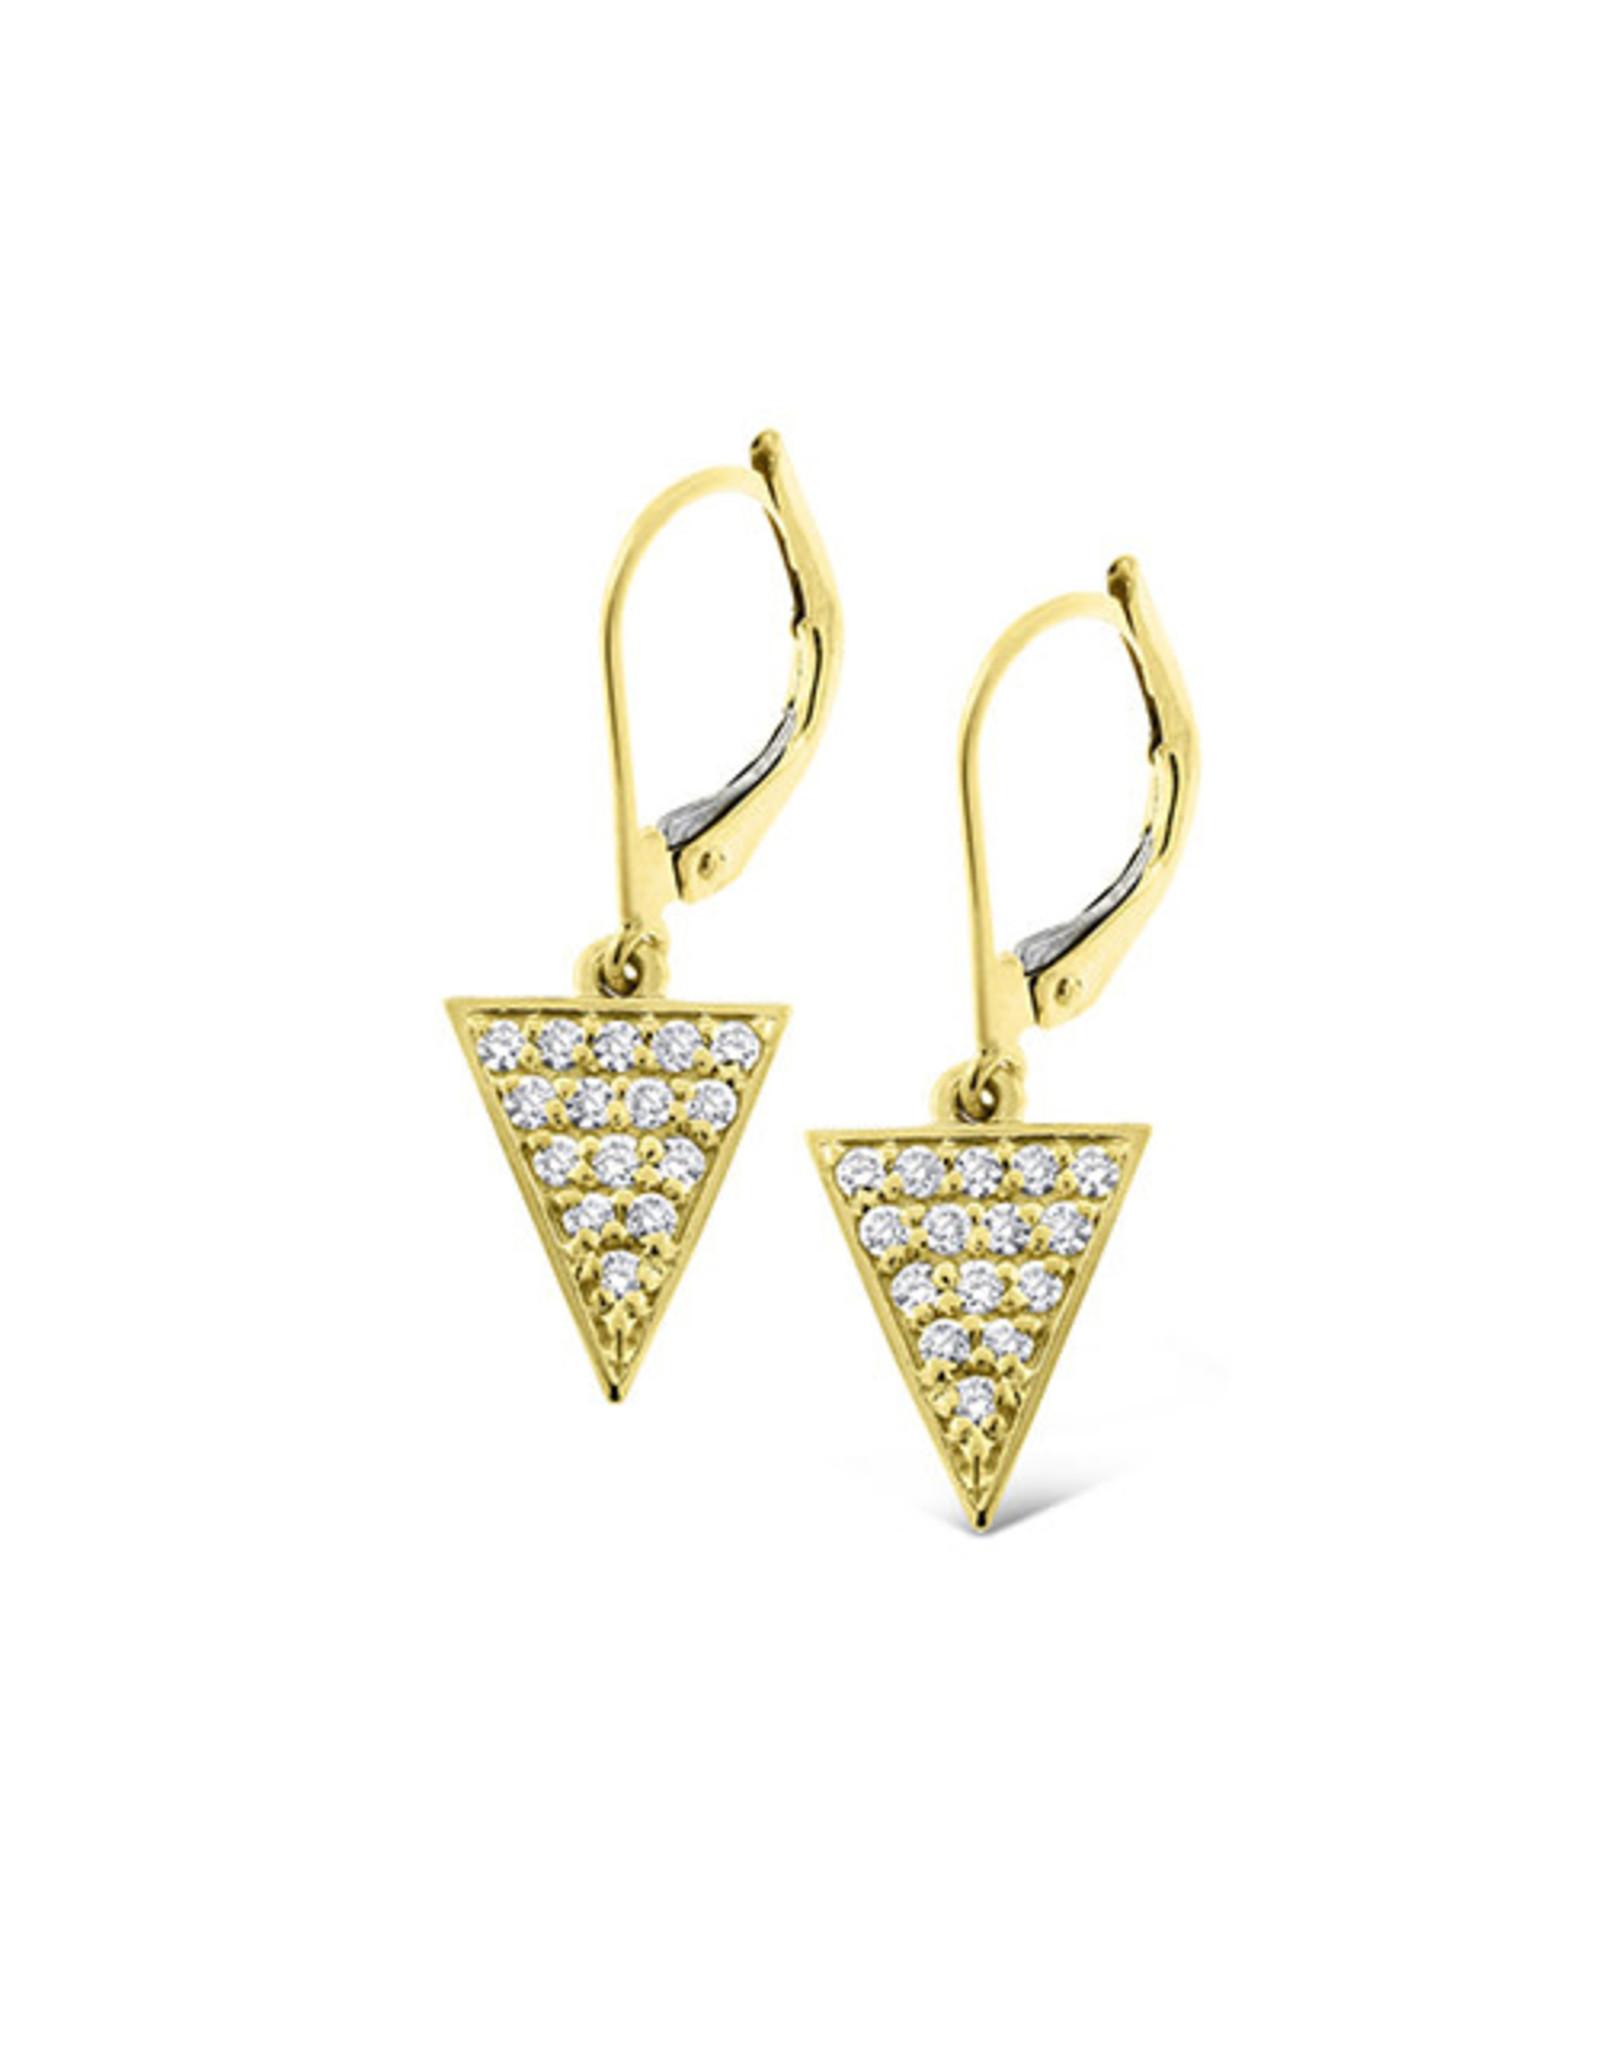 14K Yellow Gold Diamond Triangle Dangle Earrings, D: 0.30ct